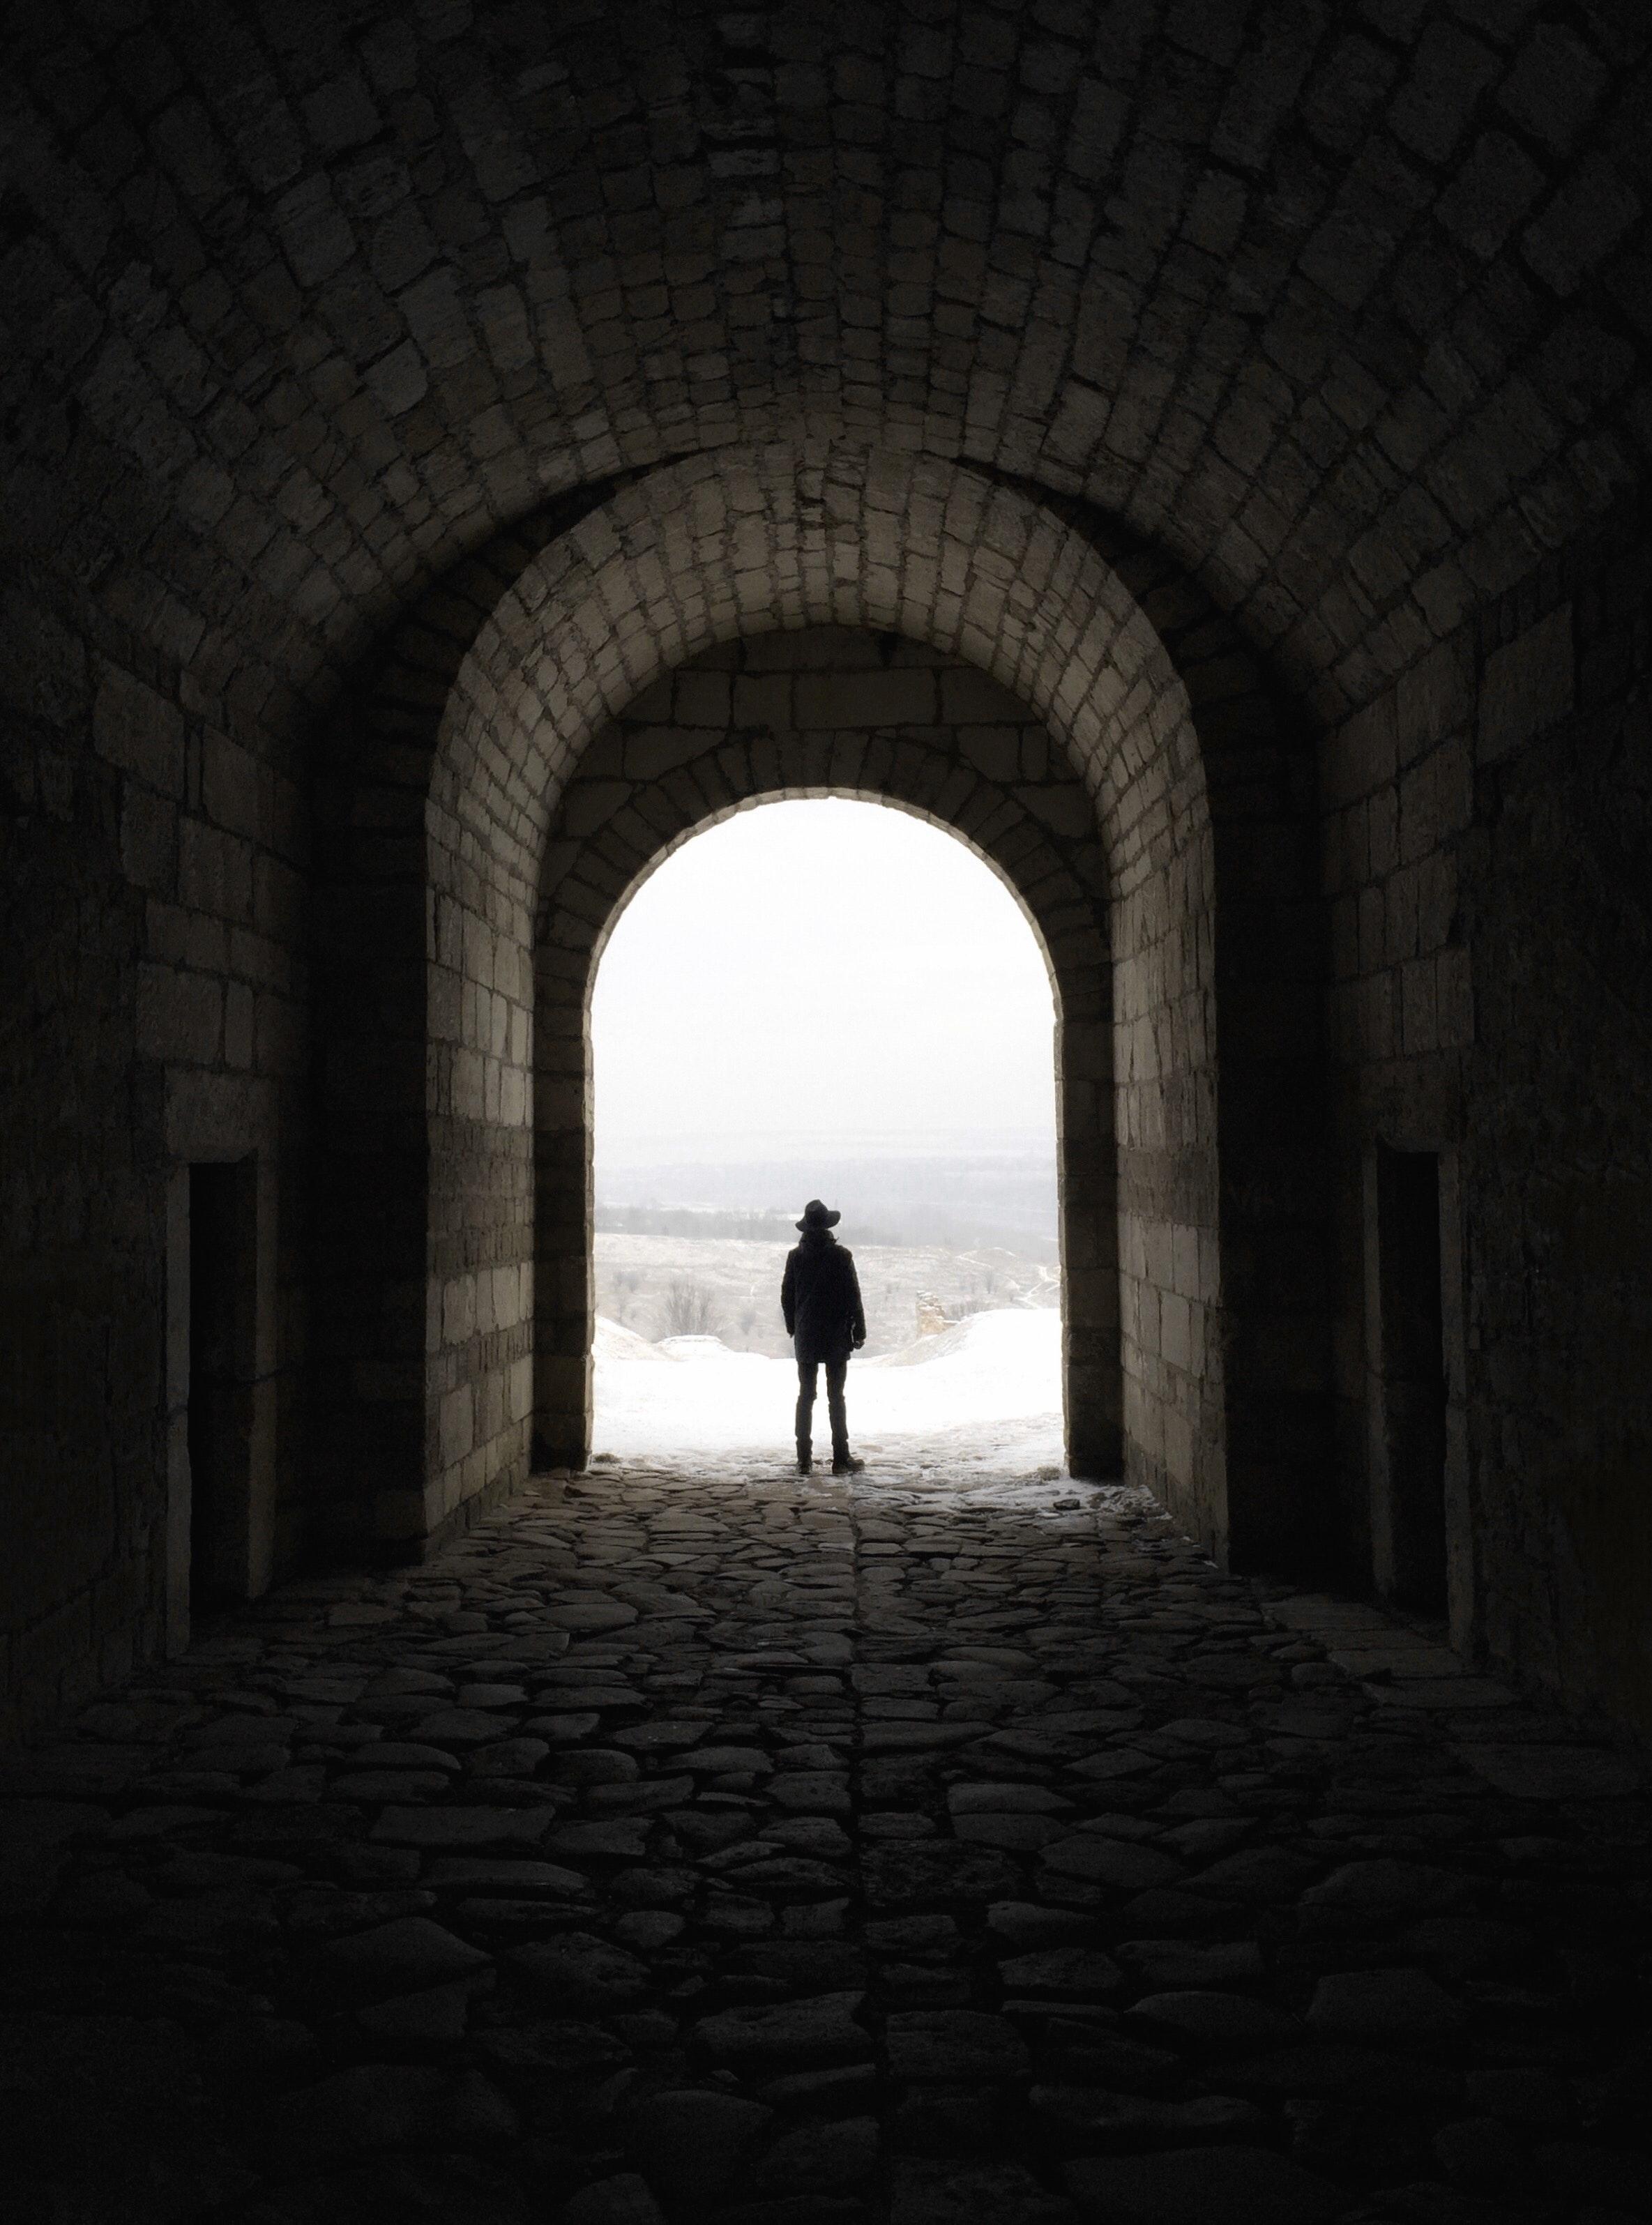 arch-cobblestones-mobilechallenge-866868.jpg